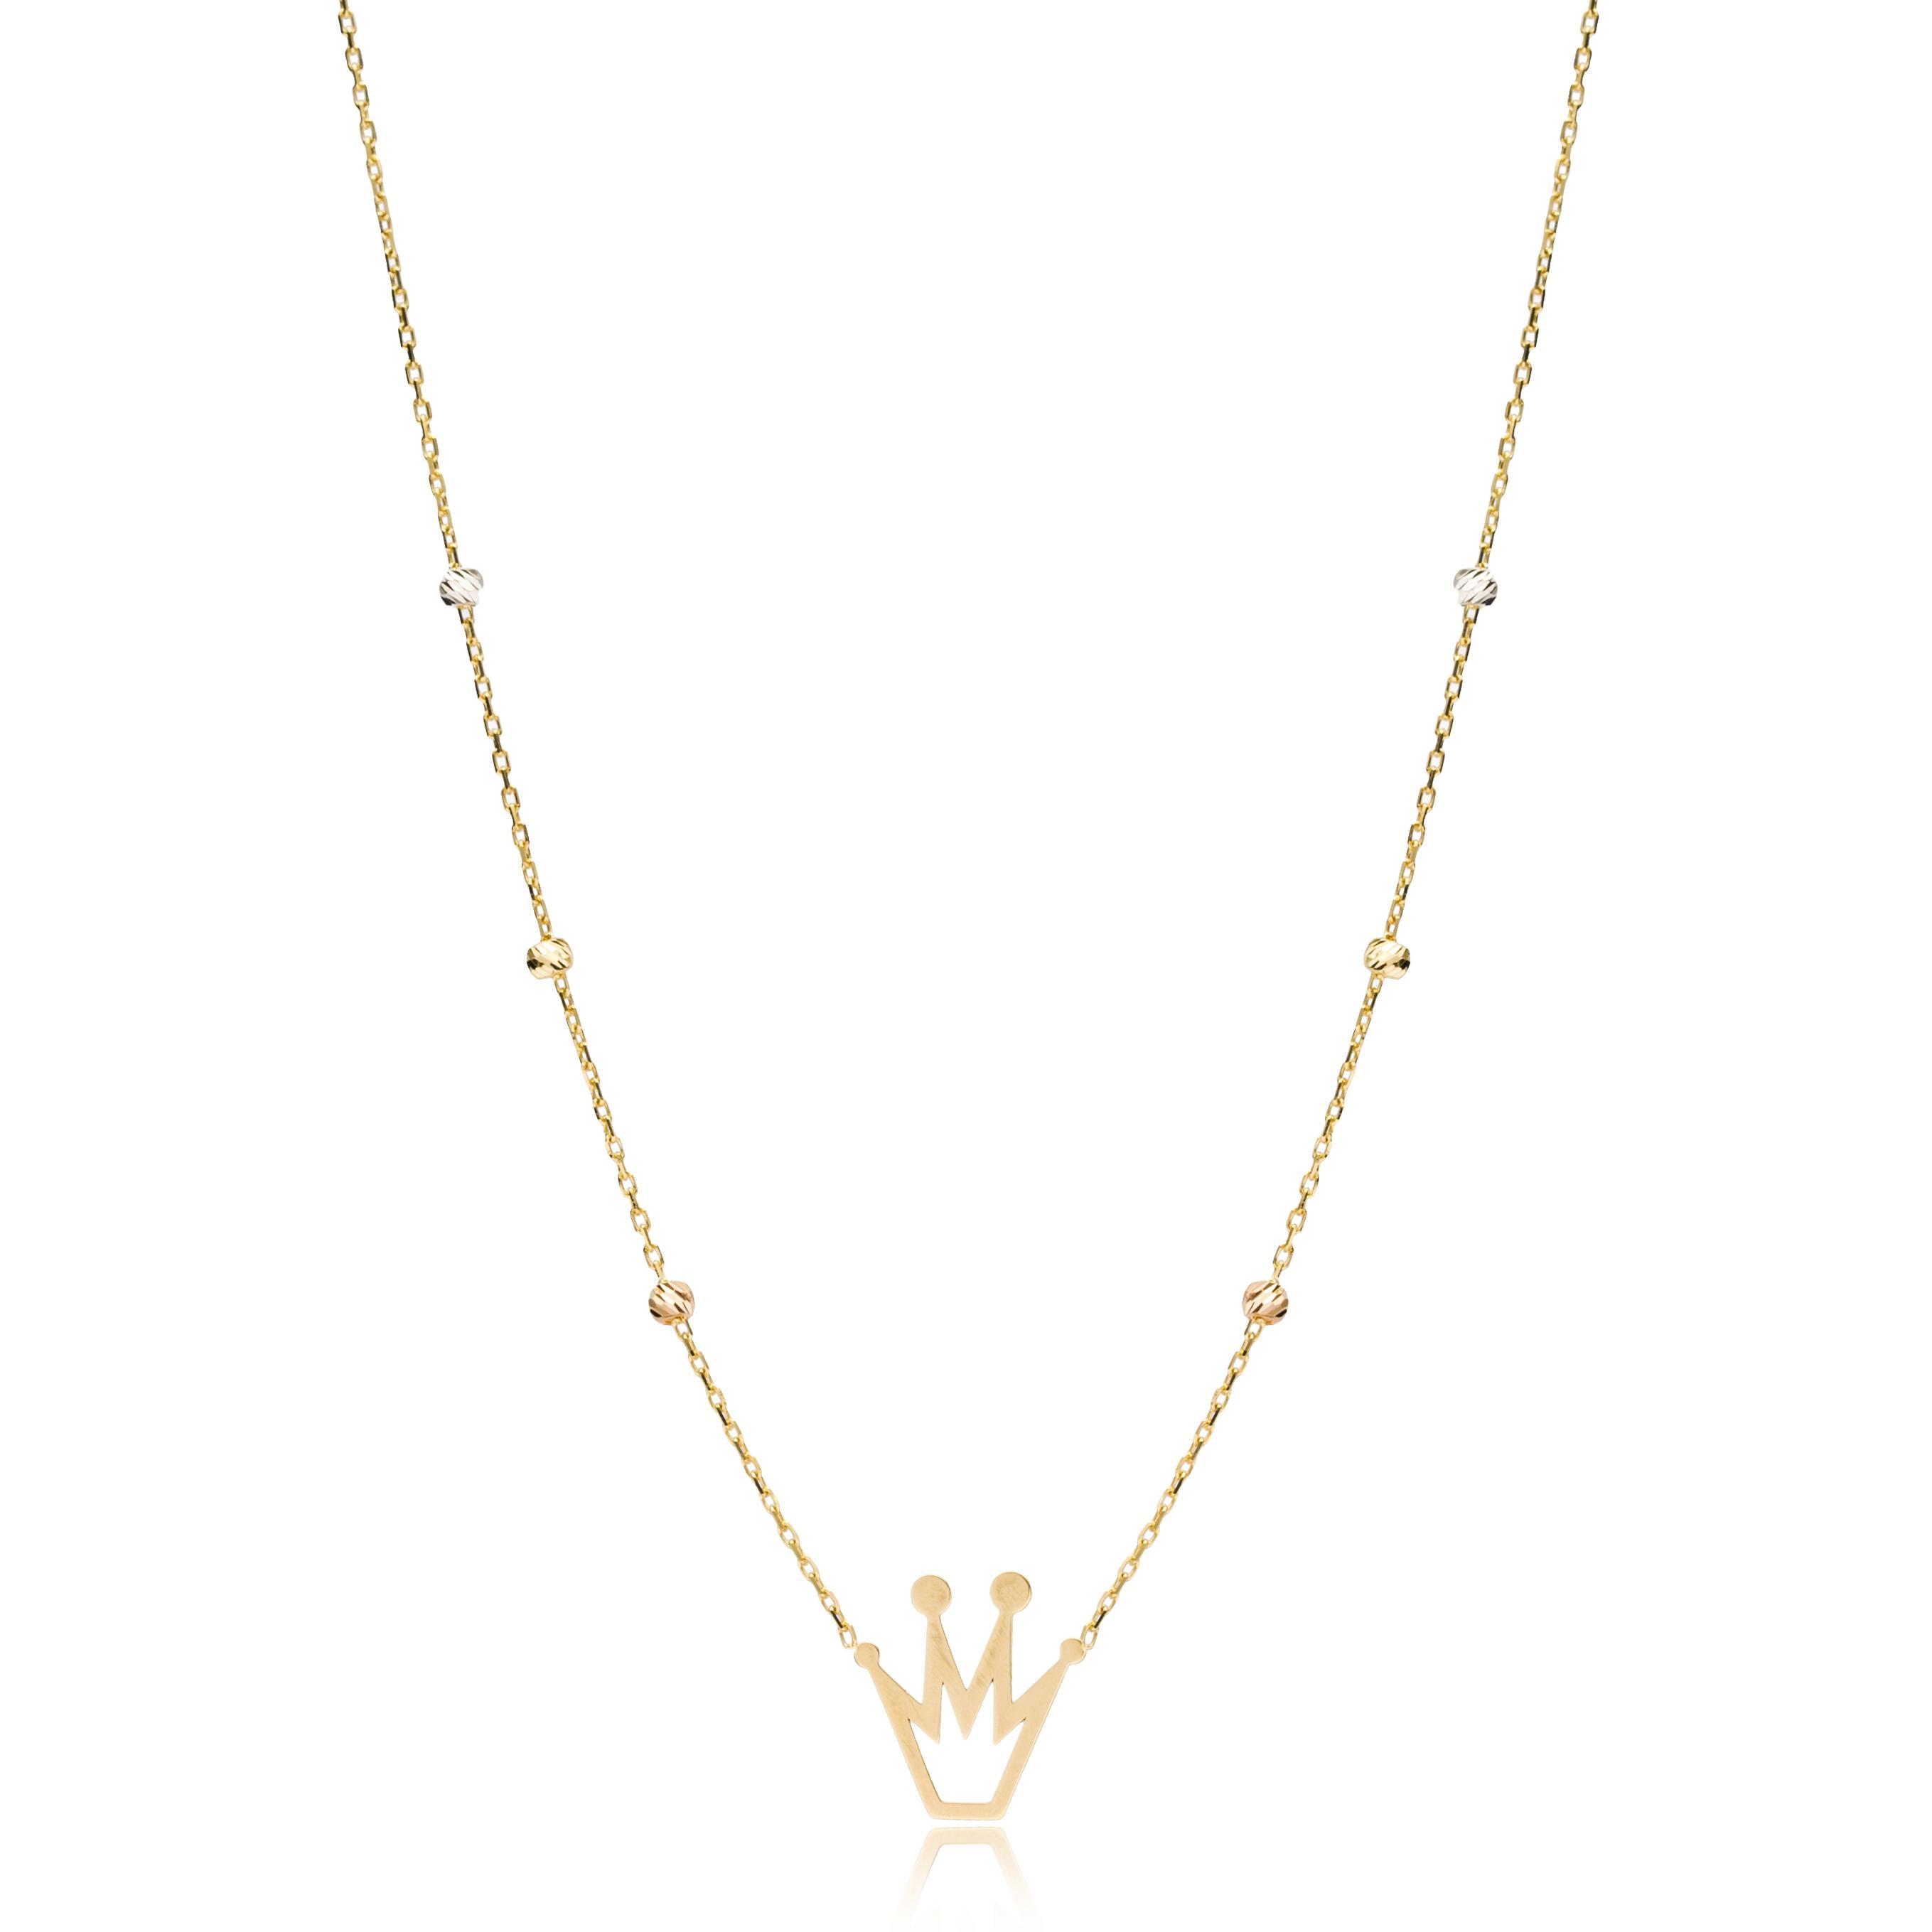 Crown Shape Necklace Wholesale Handmade Turkish 14K Jewelry